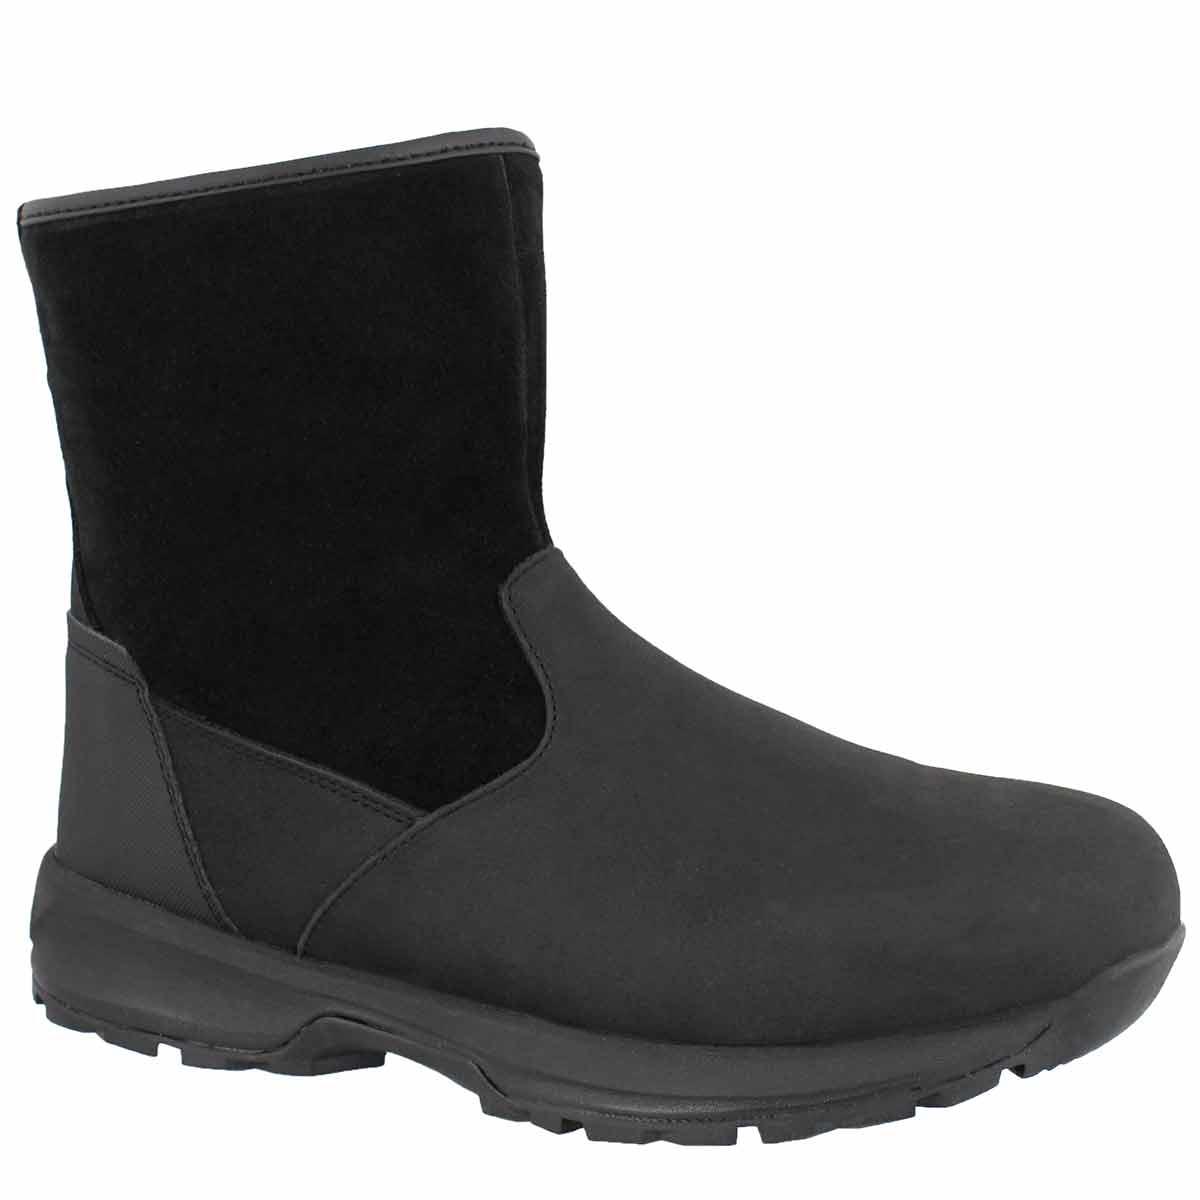 Men's BARCHAN black zip up wtpf ankle boots